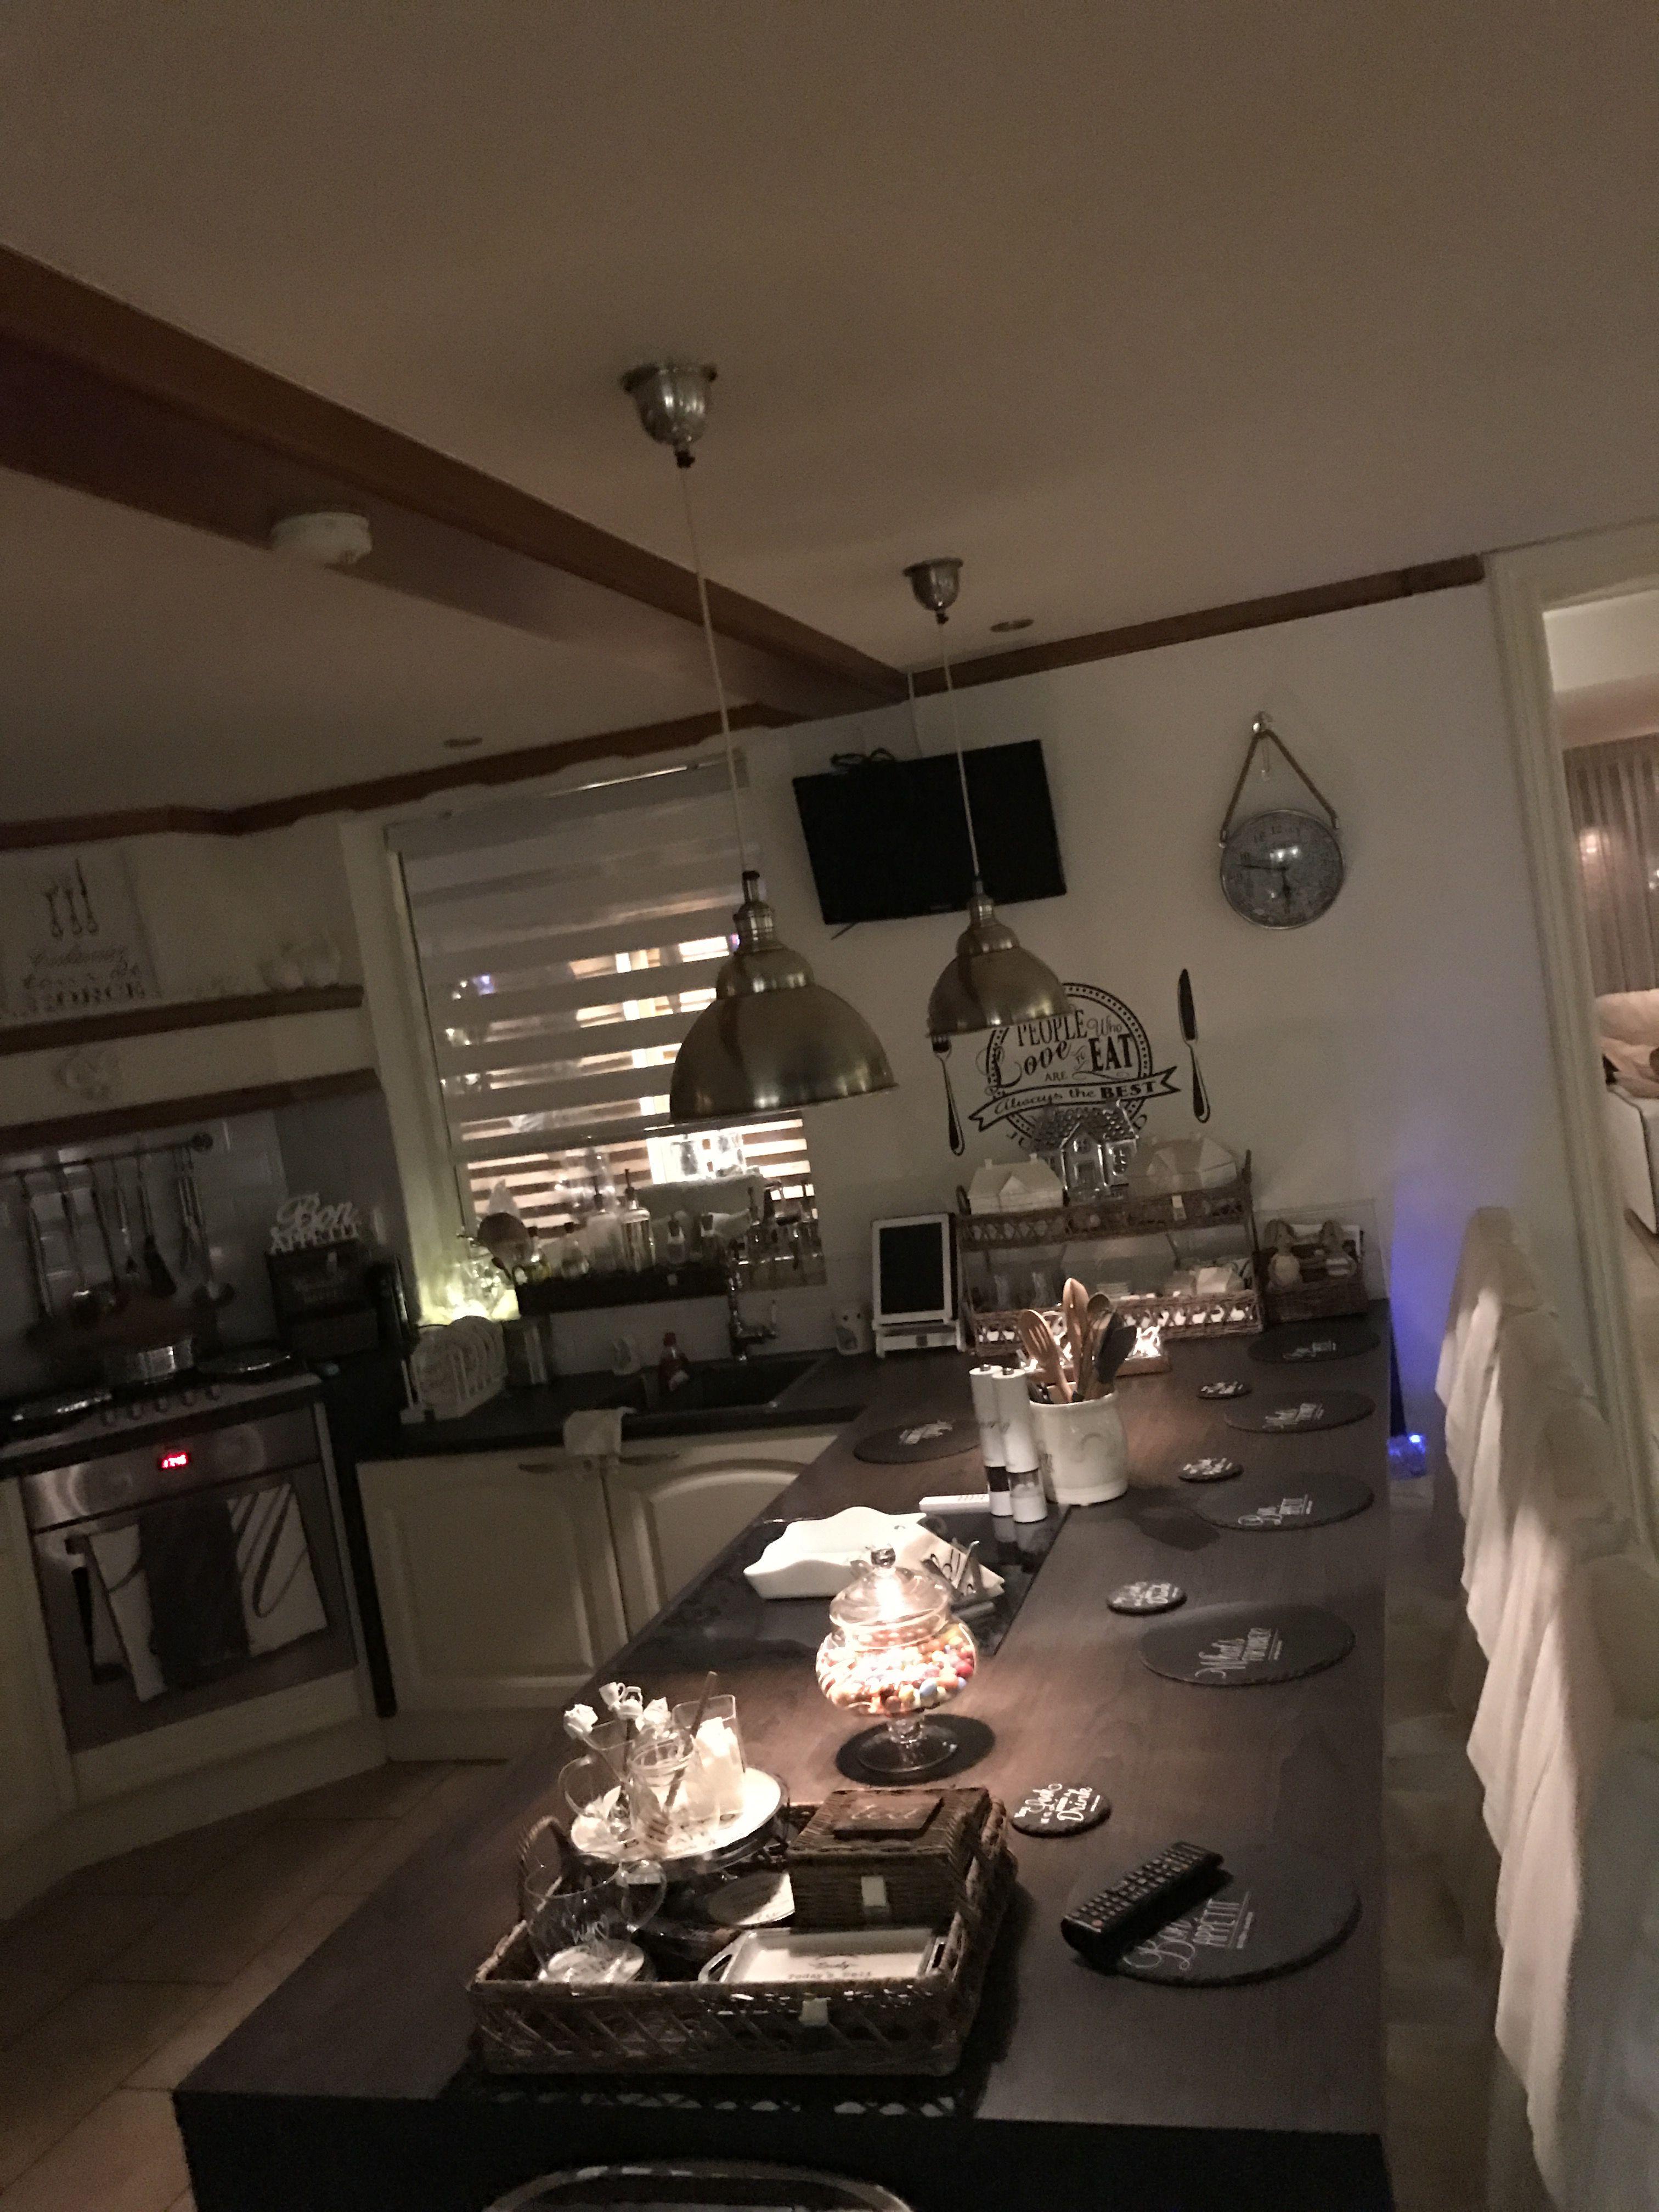 Happy met me rivièra maison lampen boven de tafel me keuken